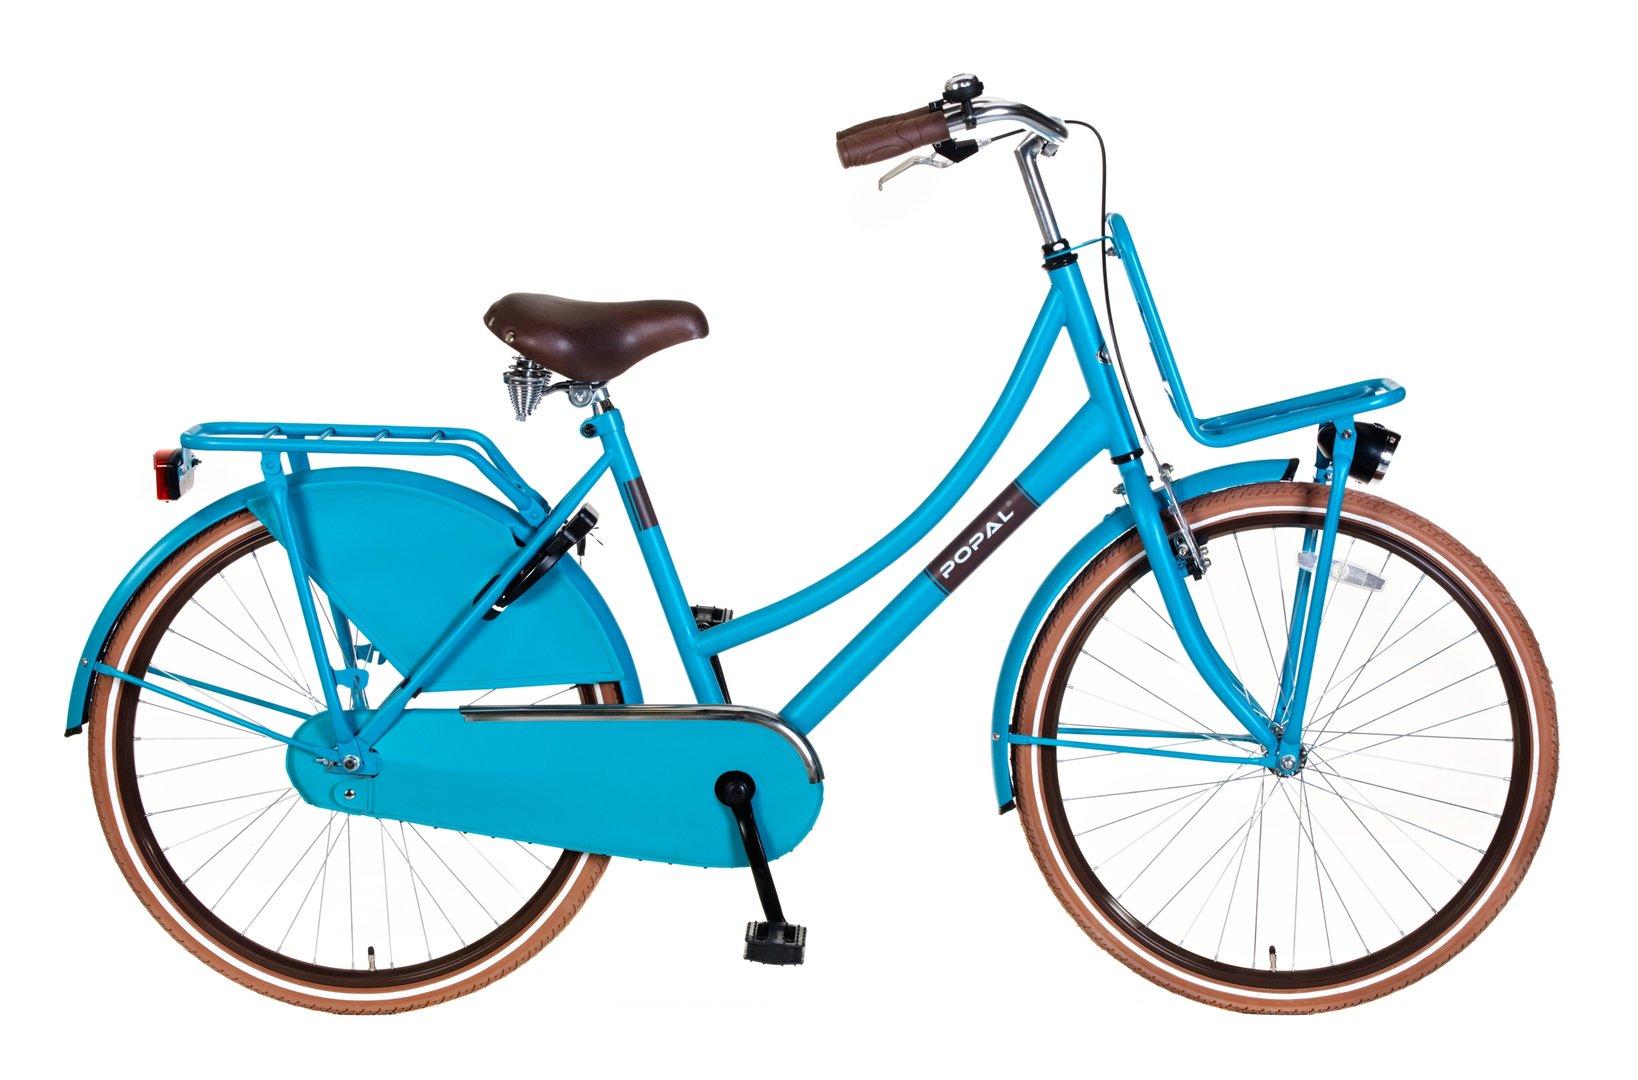 26 zoll hollandrad urban blau mit frontr ger fahrrad ass. Black Bedroom Furniture Sets. Home Design Ideas